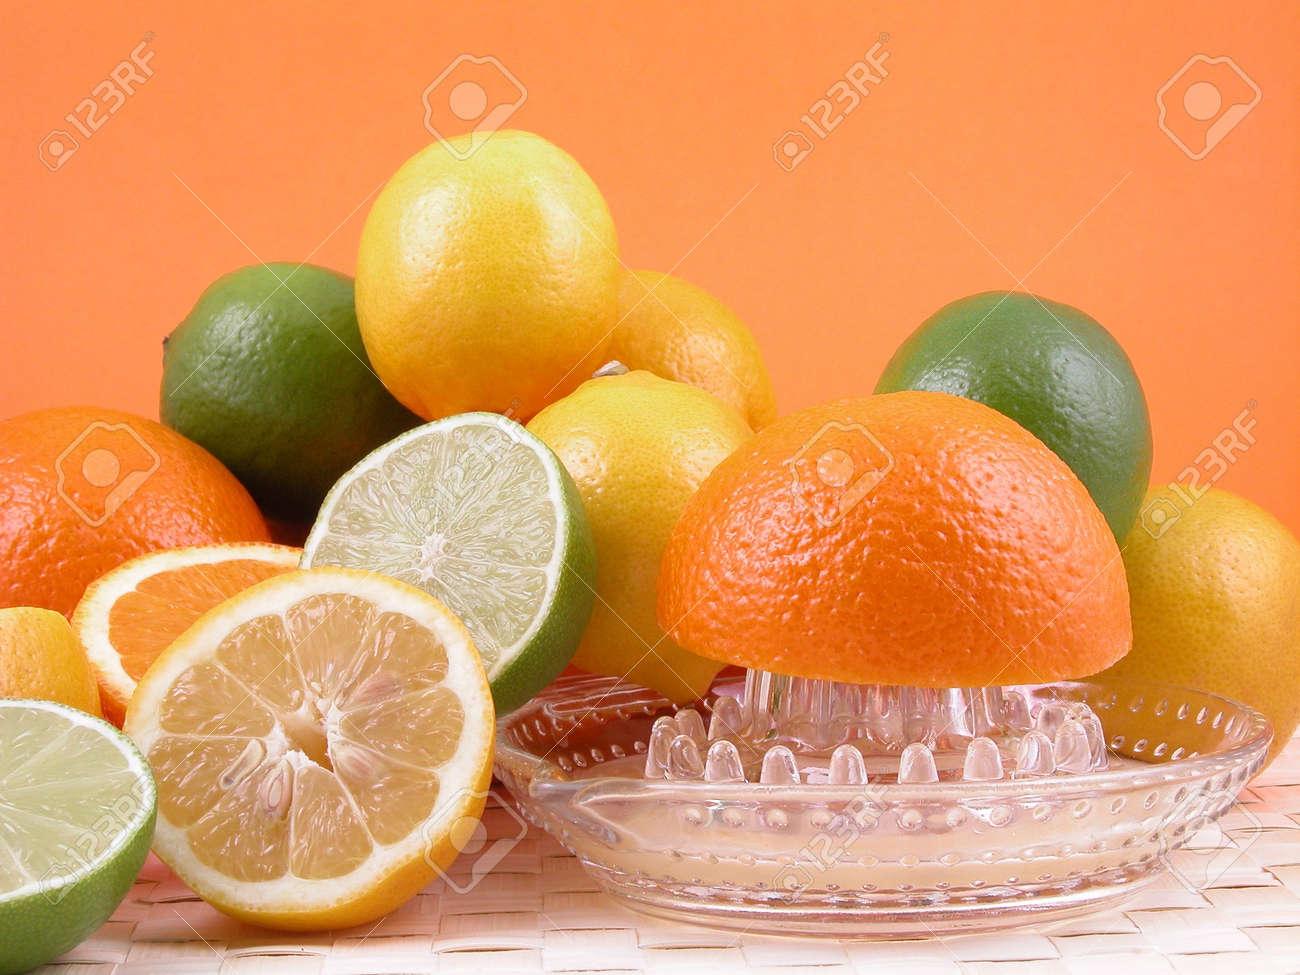 multivitamins natural juice - oranges lemons and limes Stock Photo - 471515